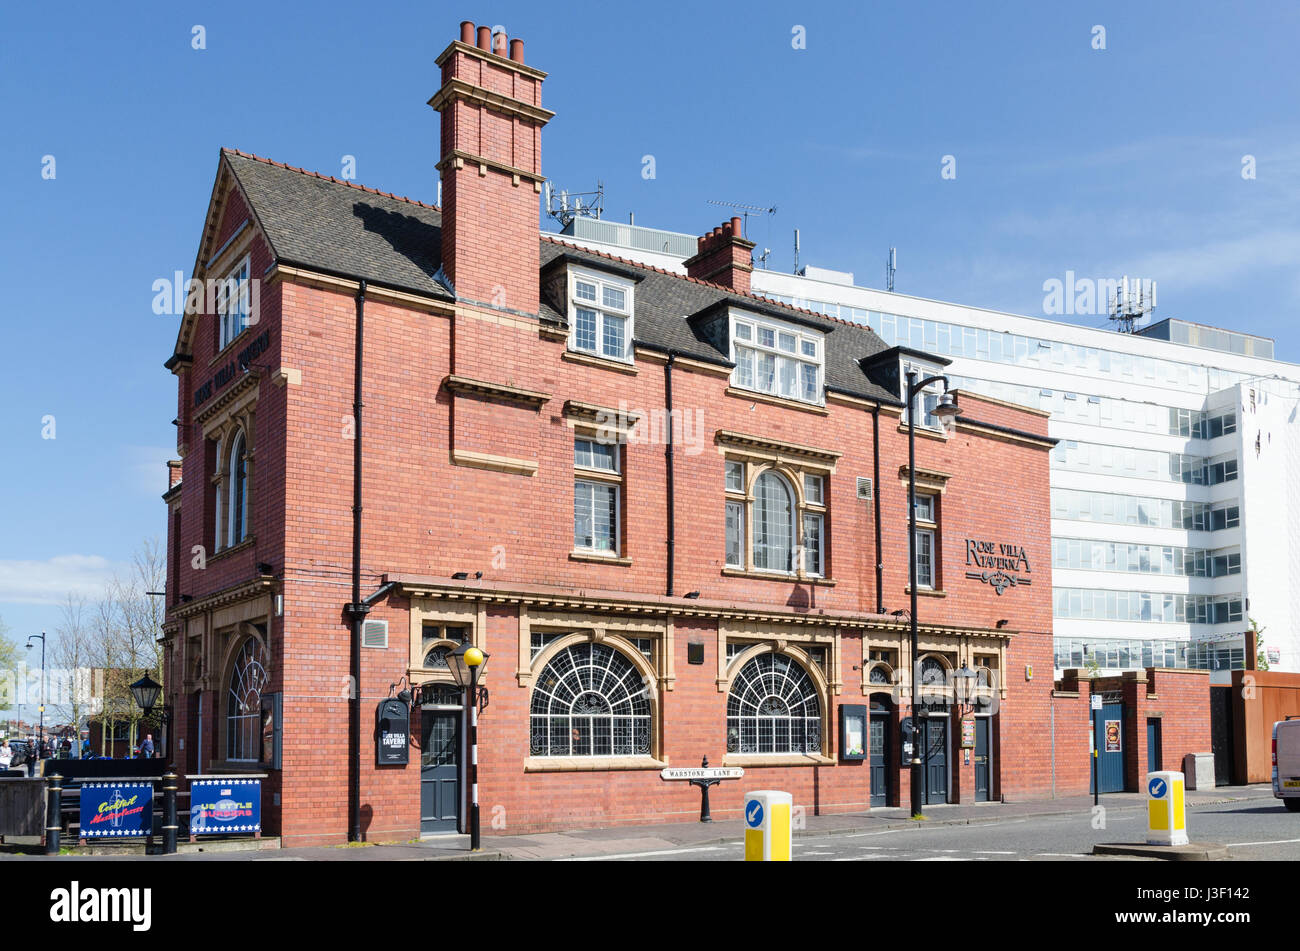 The Rose Villa Tavern traditional public house in Birmingham's Jewellery Quarter - Stock Image